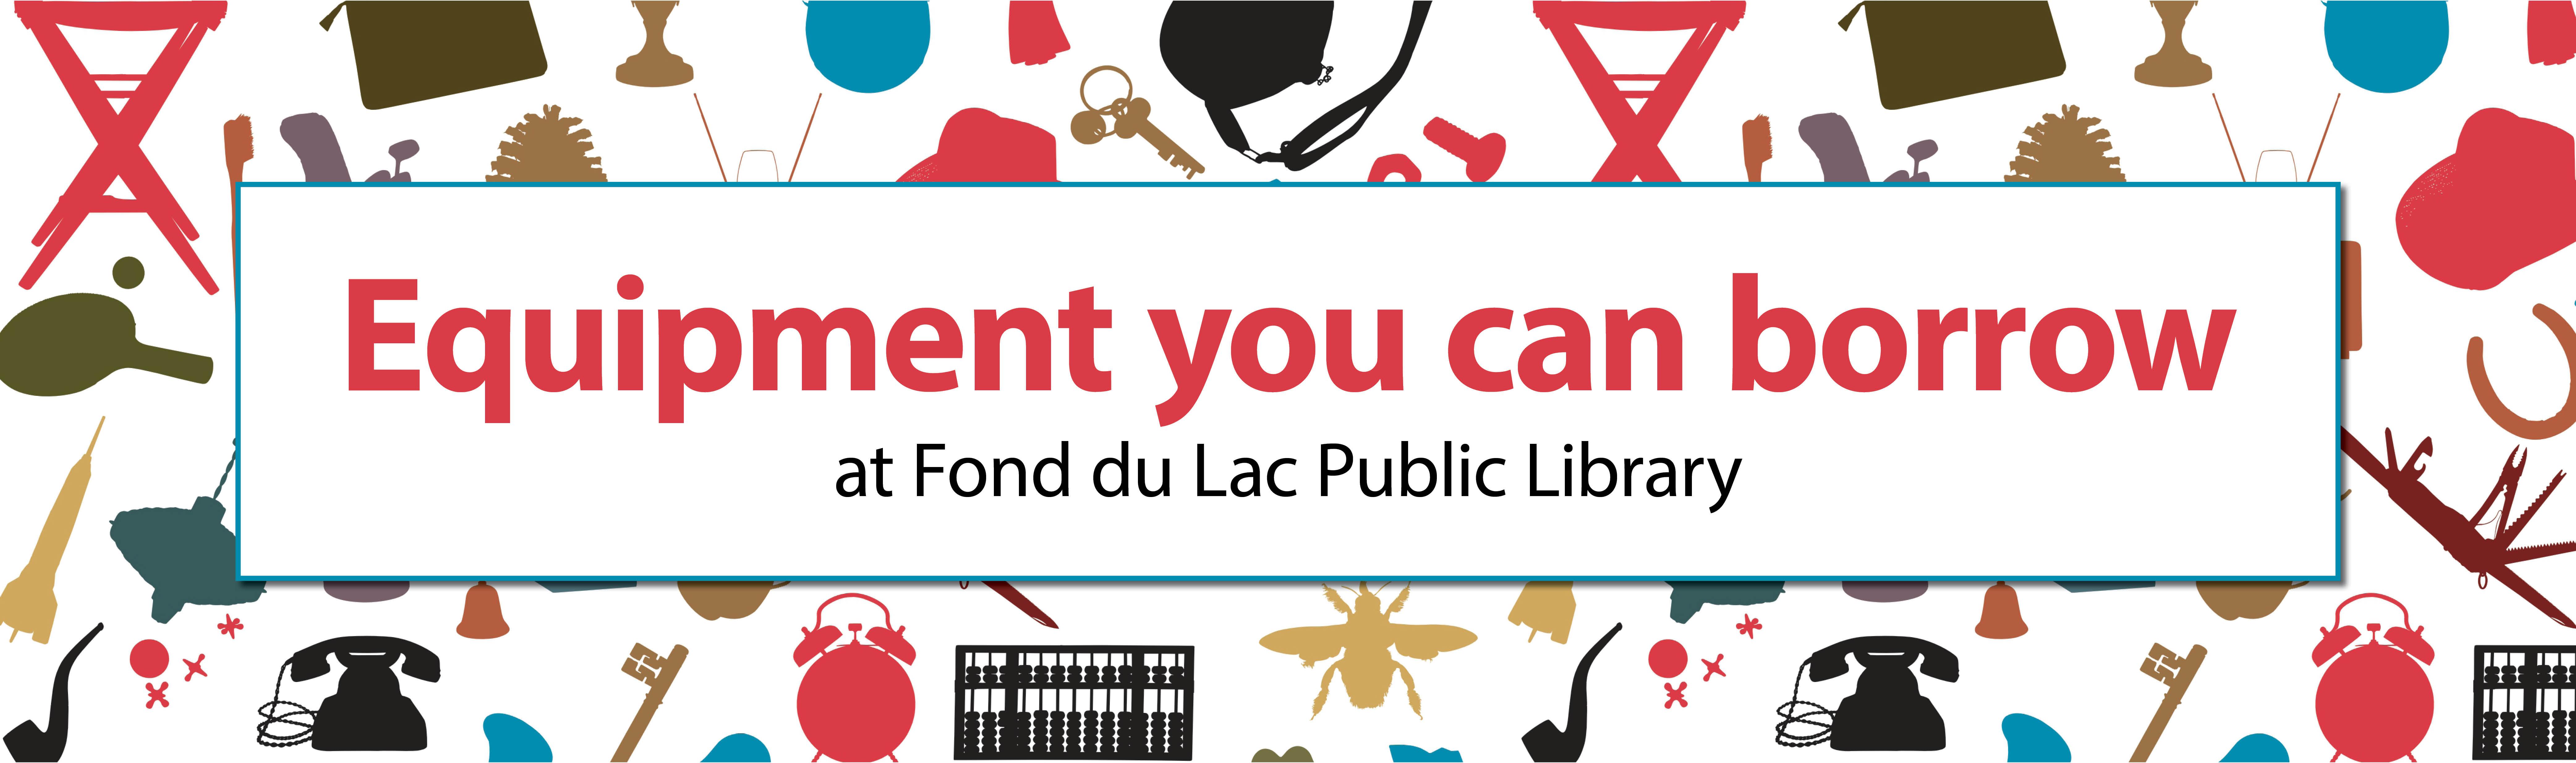 Equipment To Borrow Fond Du Lac Wi Public Library